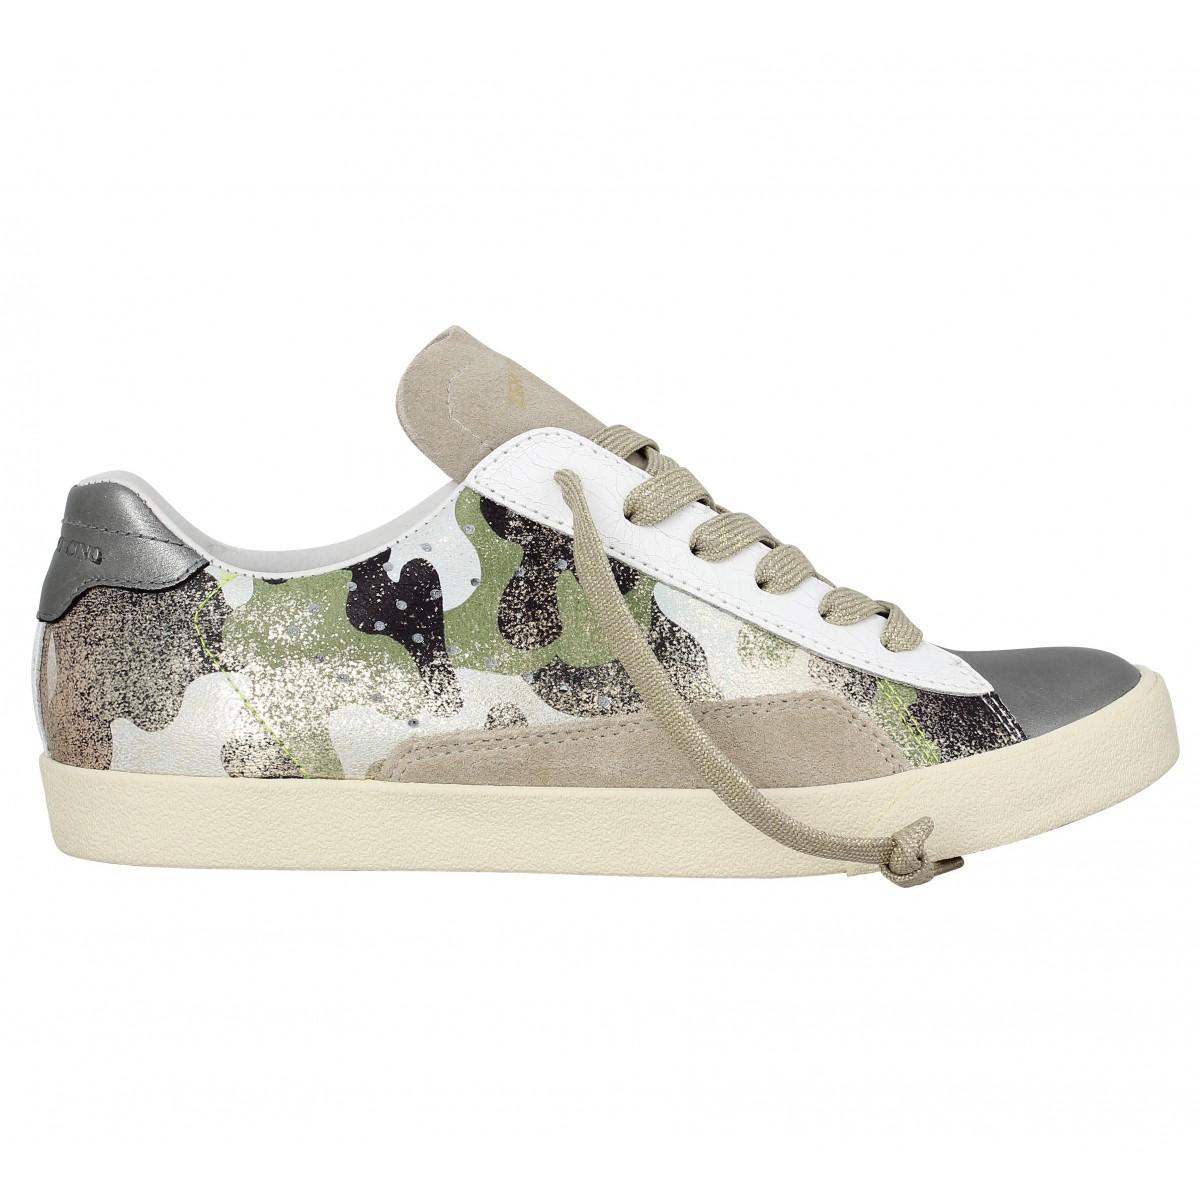 Chaussures - Bas-tops Et Baskets 0-105 Zéro Cent Five 3N1kiGW